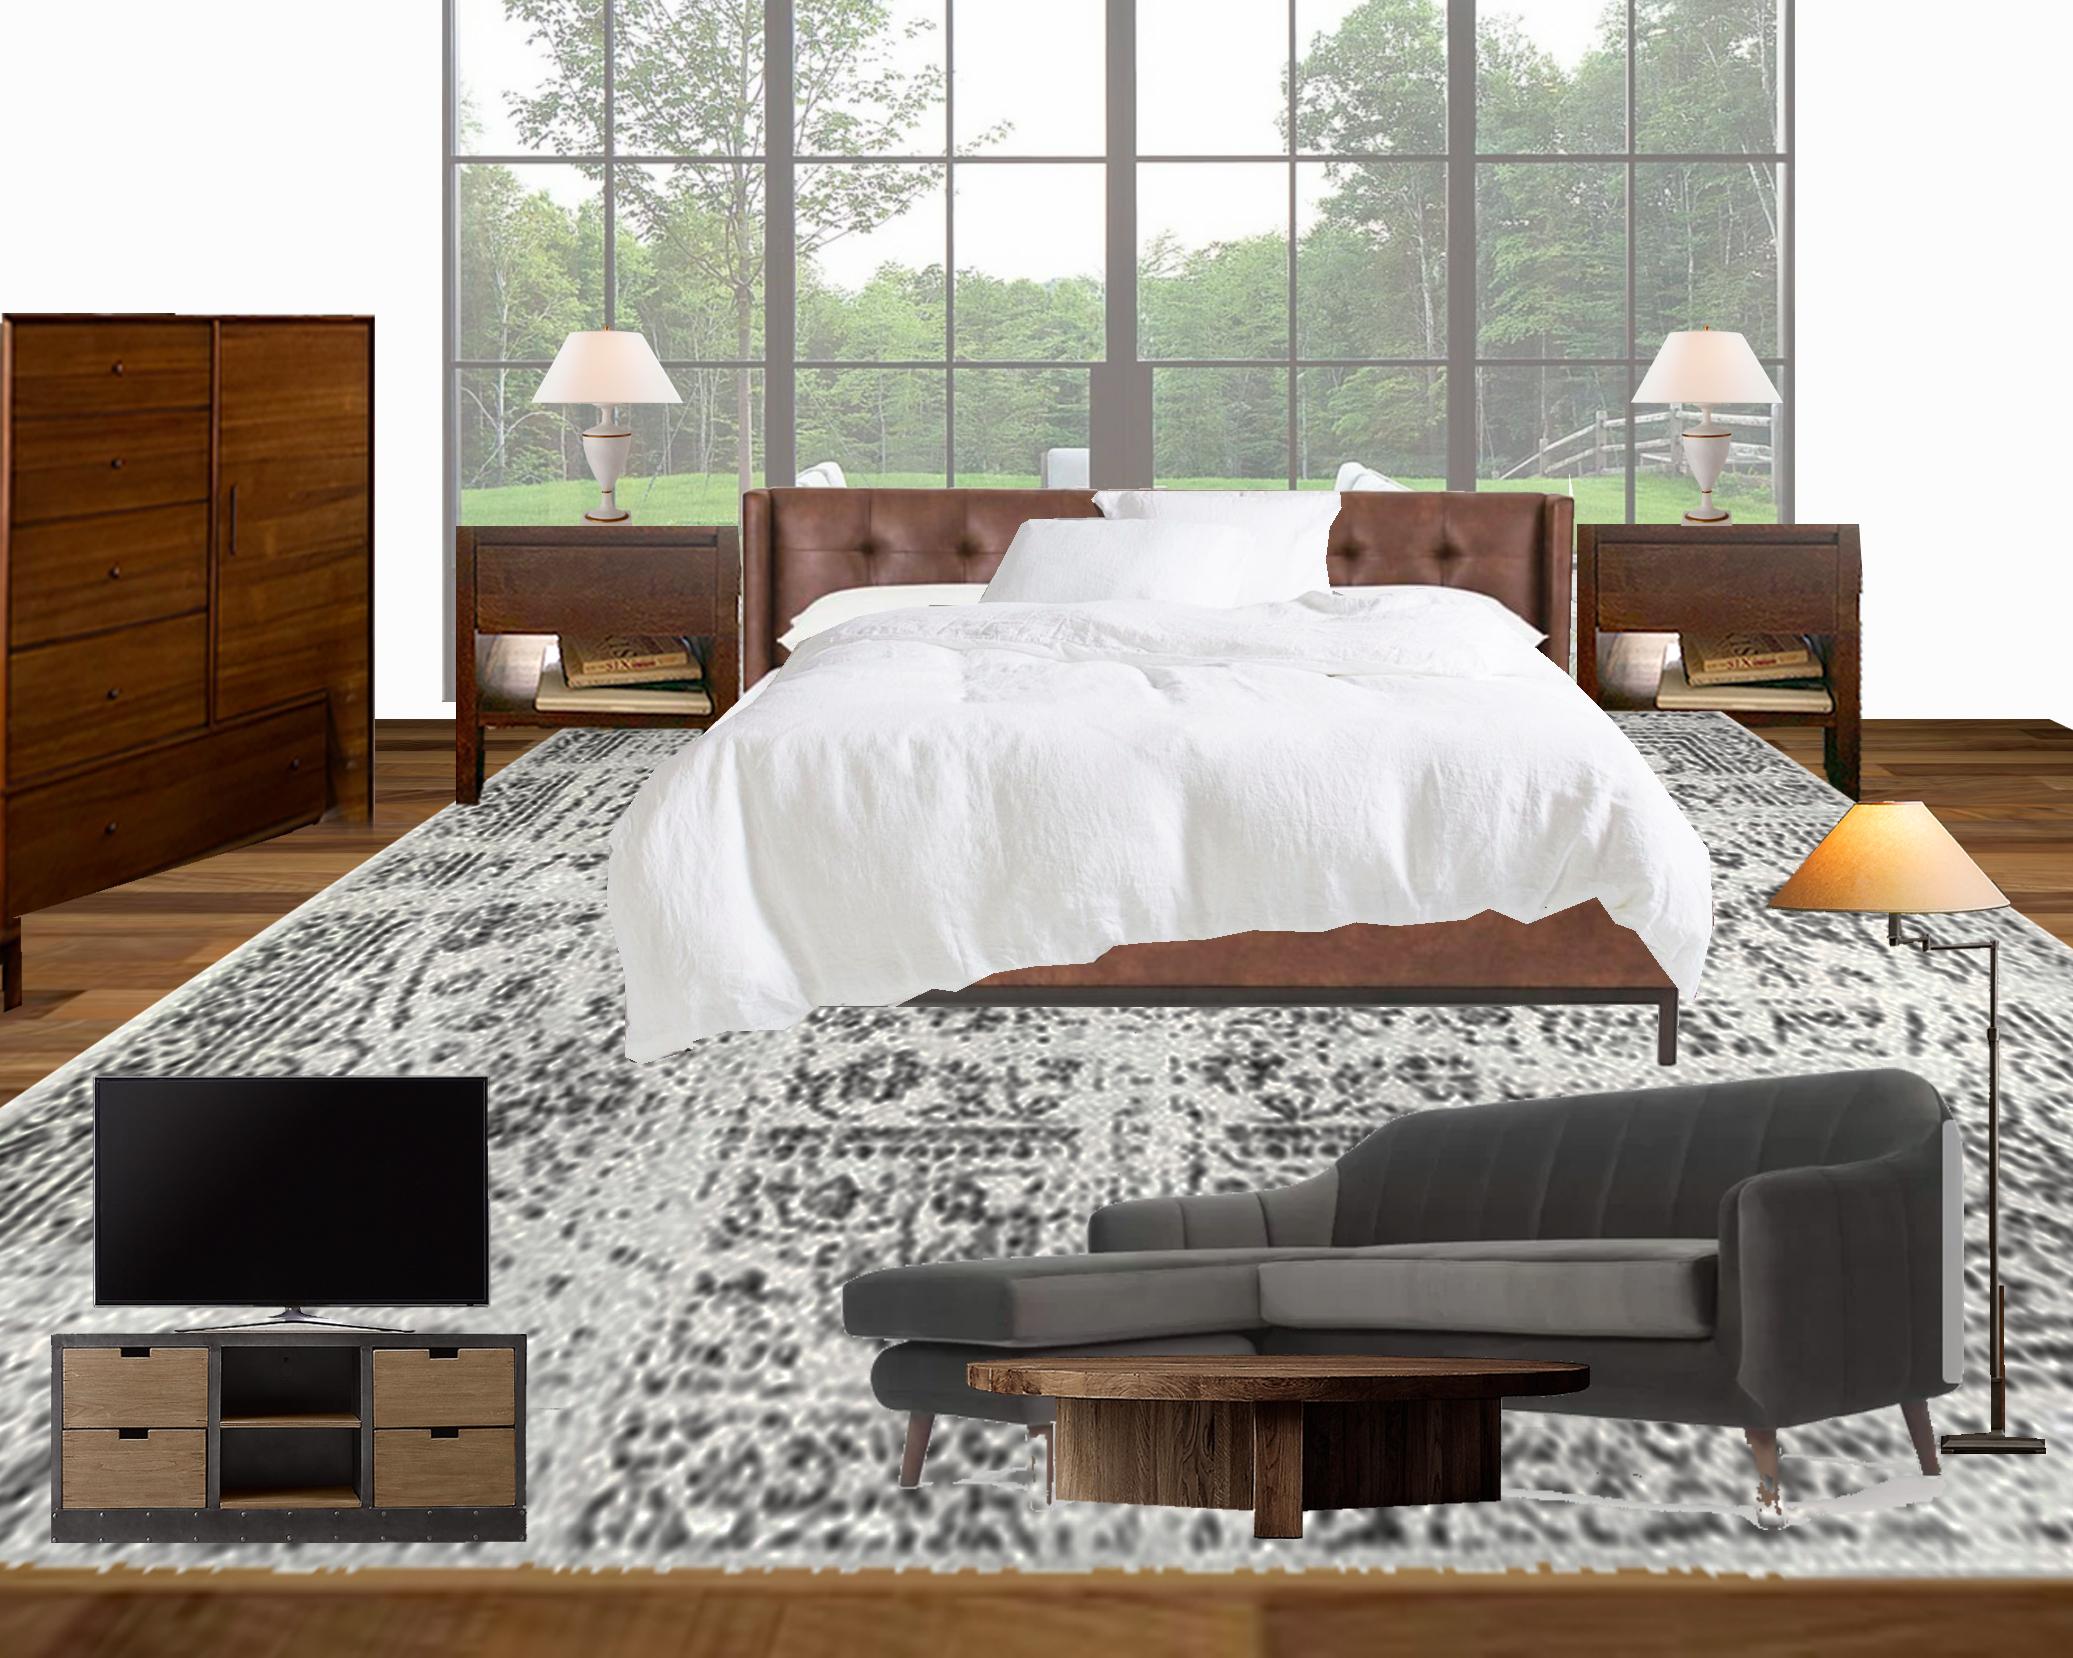 mood board bedroom w tv.jpg